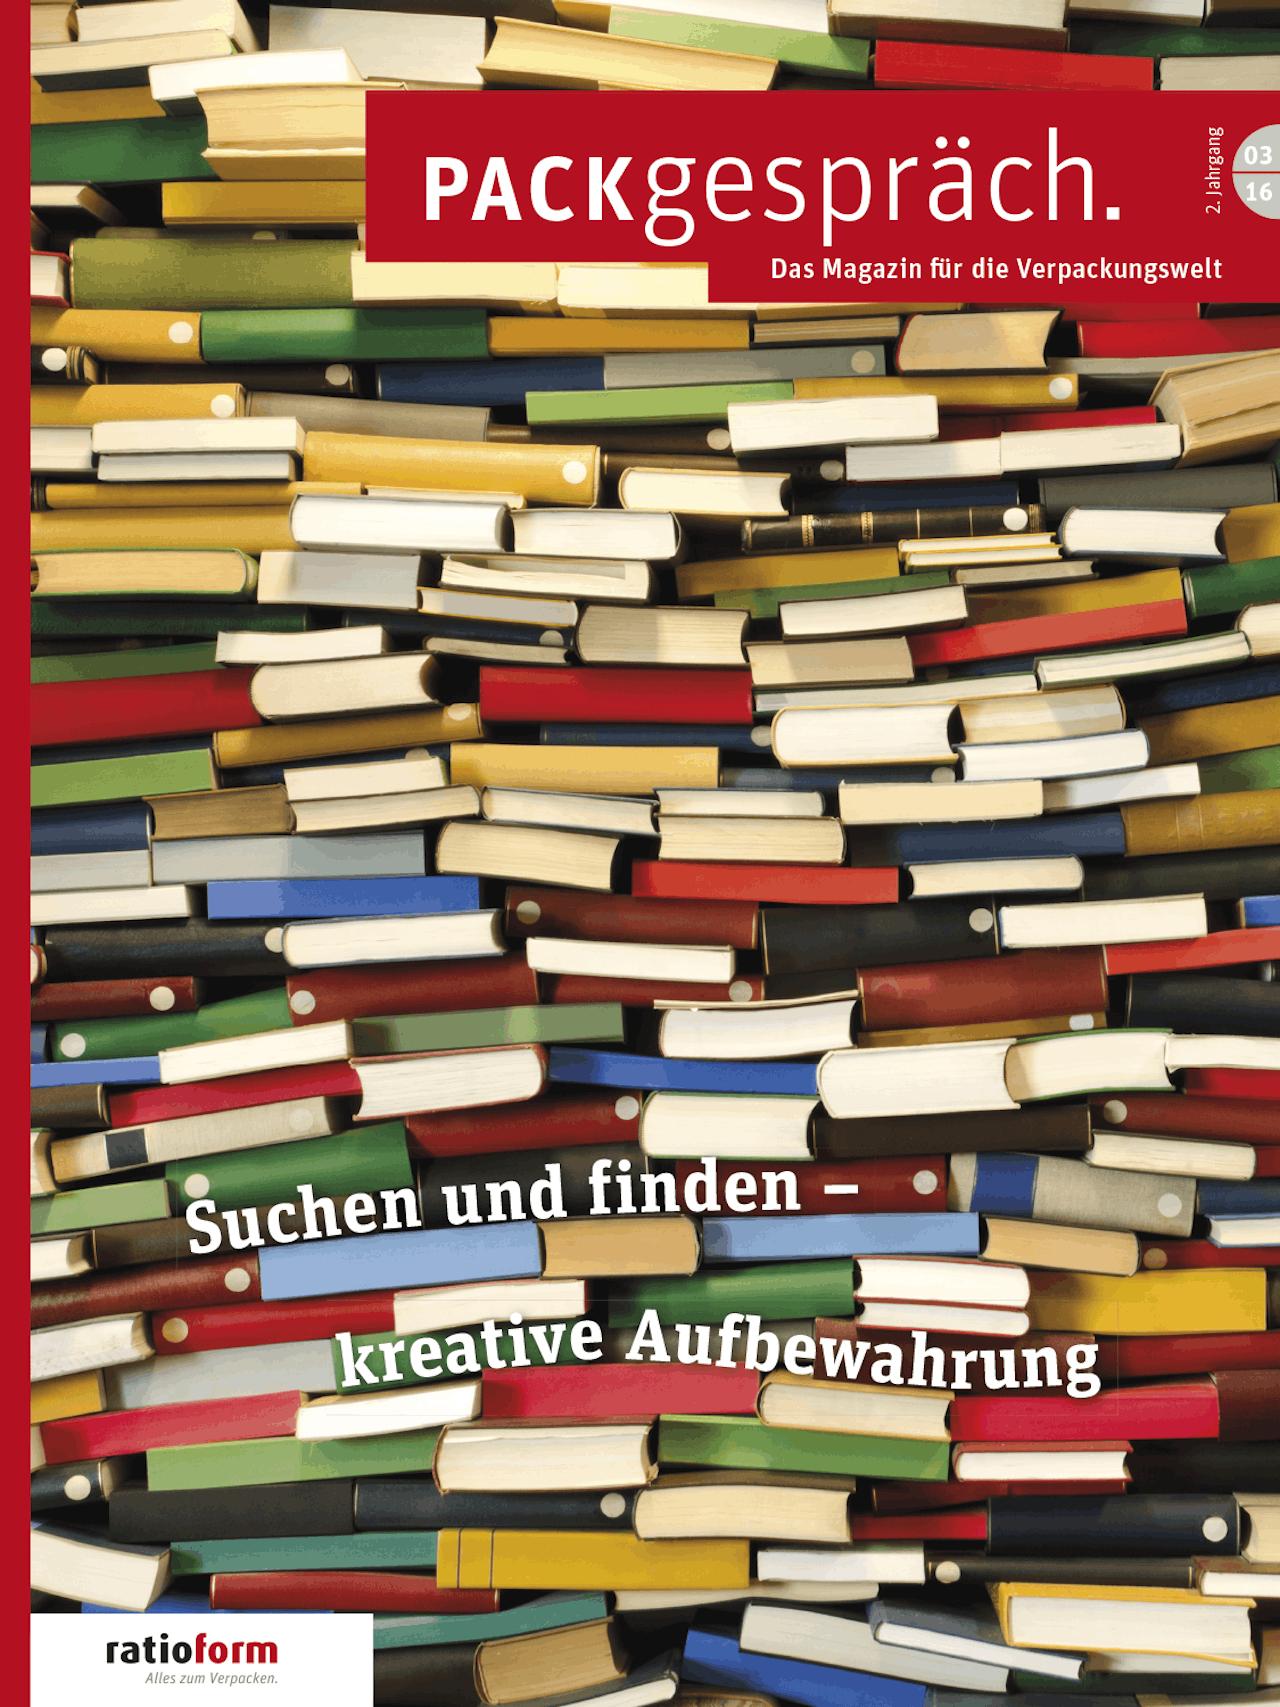 Packgespräch, Magazin Verpackungswelt 03 16